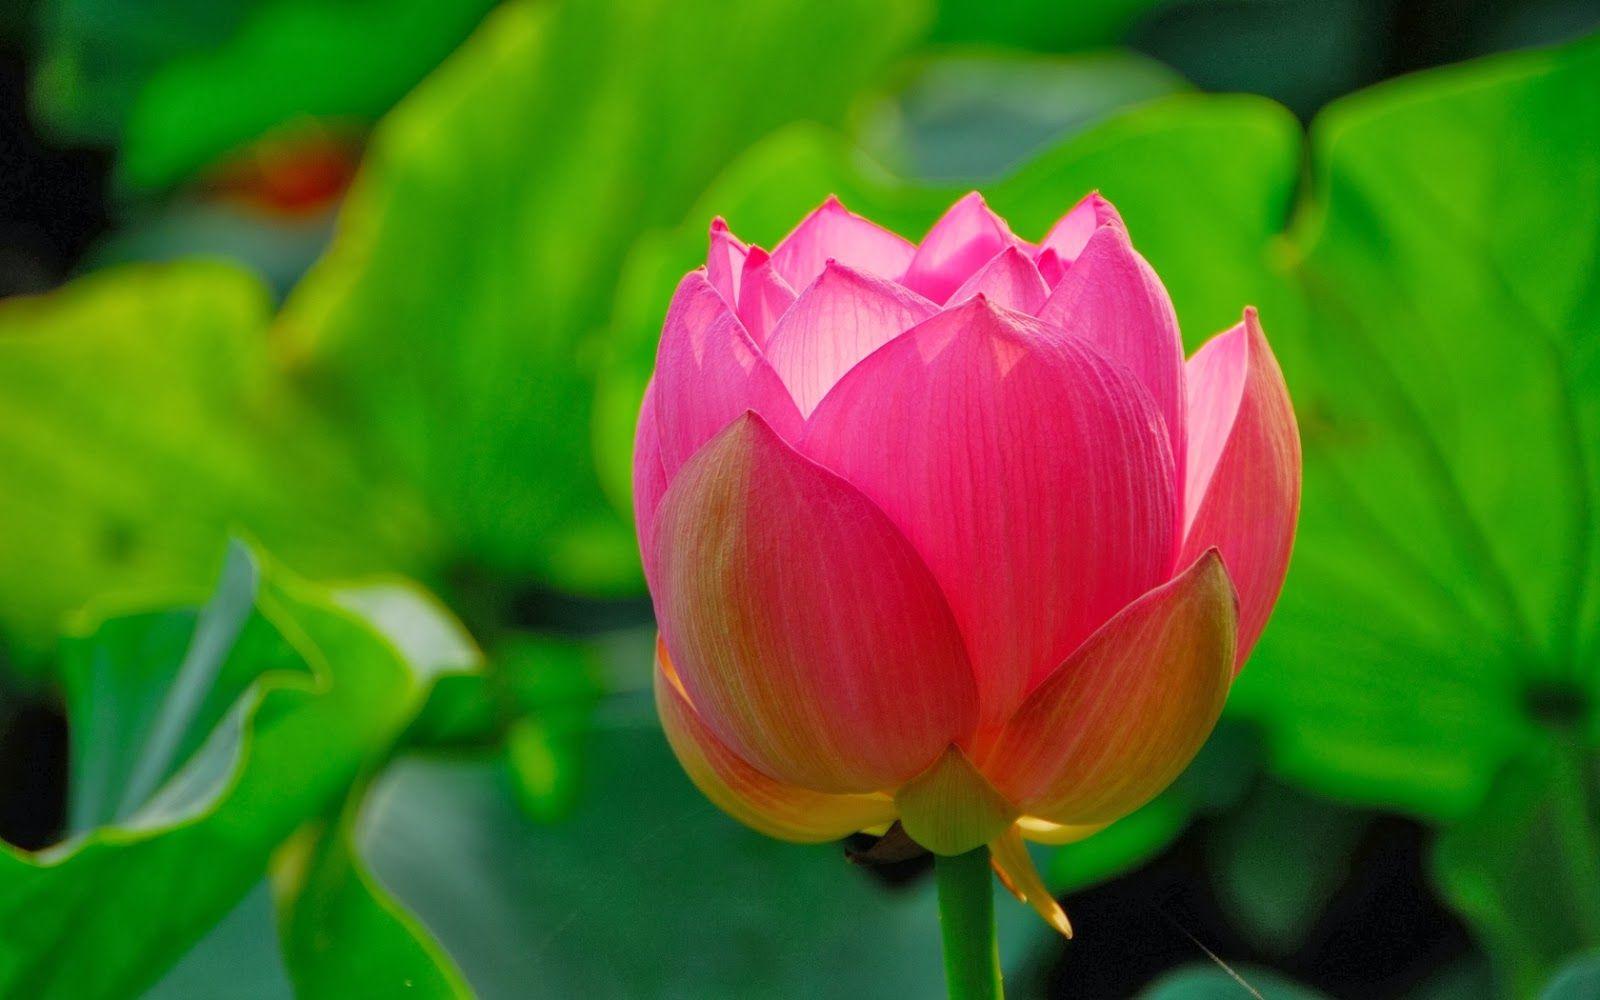 Fotos de flores bonitas gratis para fondo de pantalla en for Imagenes bonitas para fondo de pantalla